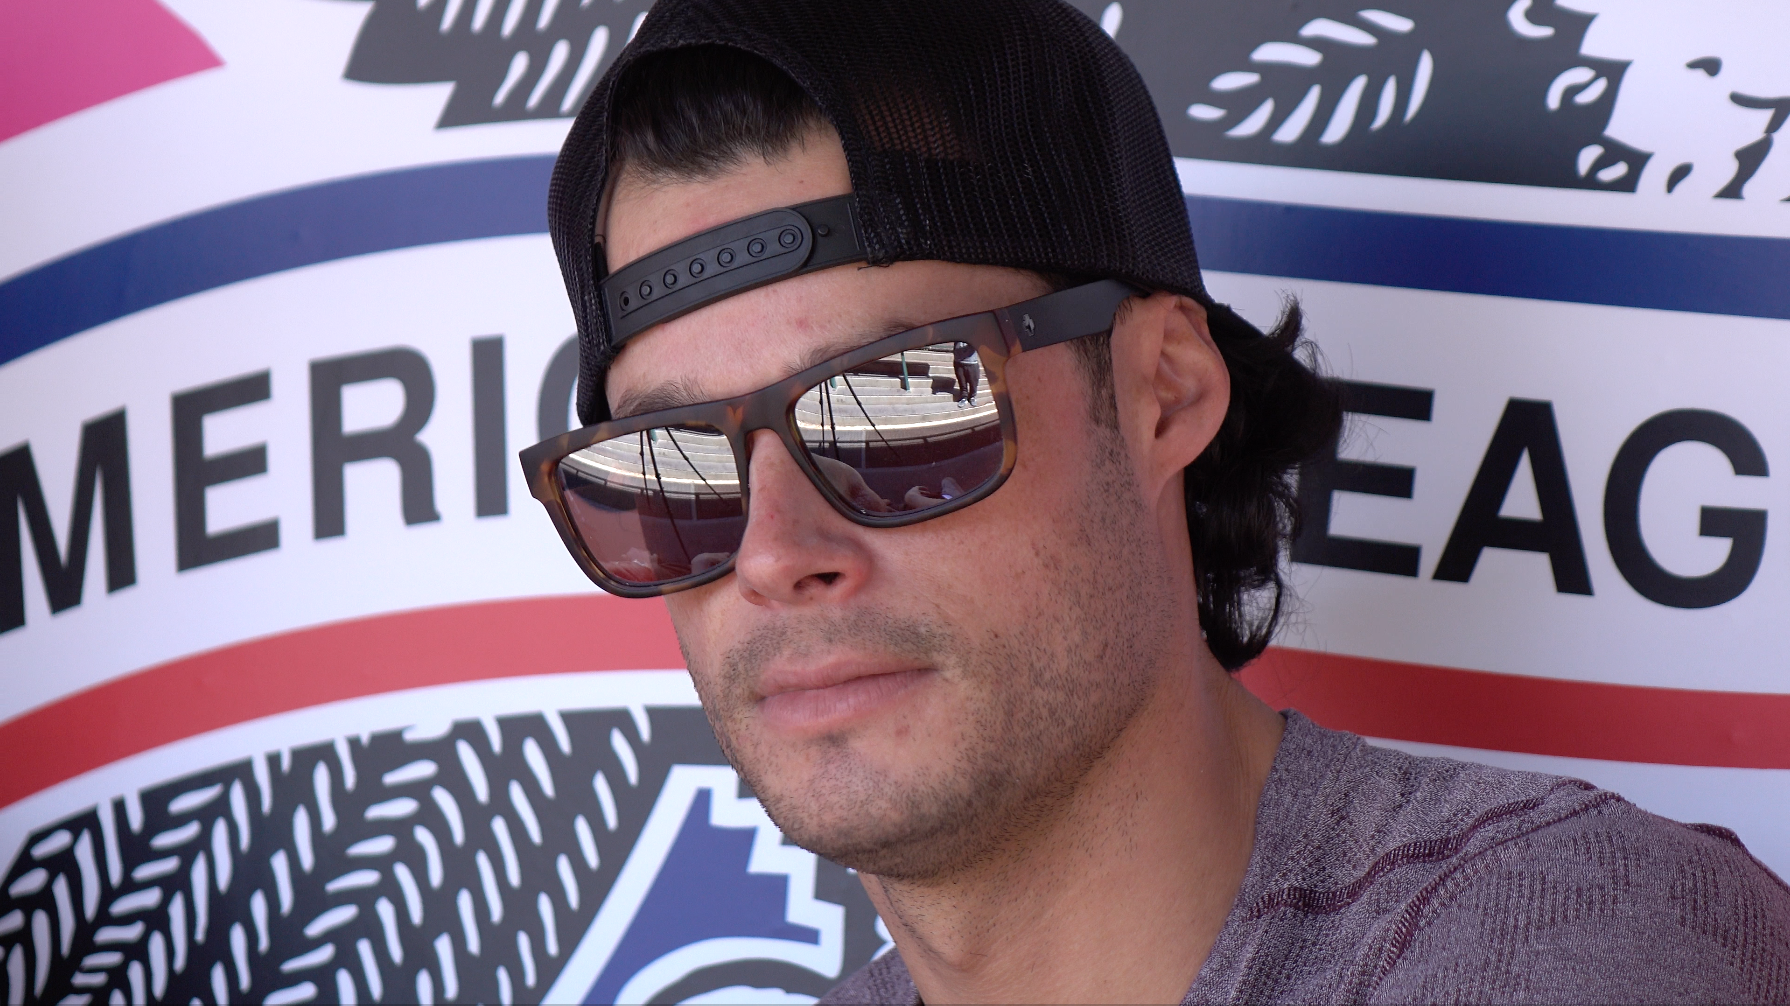 c89c8f2116d4 Joe Kelly Rocks Custom Prescription Sunglasses. SPY Discord Vintage  Tortoise with SportRx Win-Win lenses!